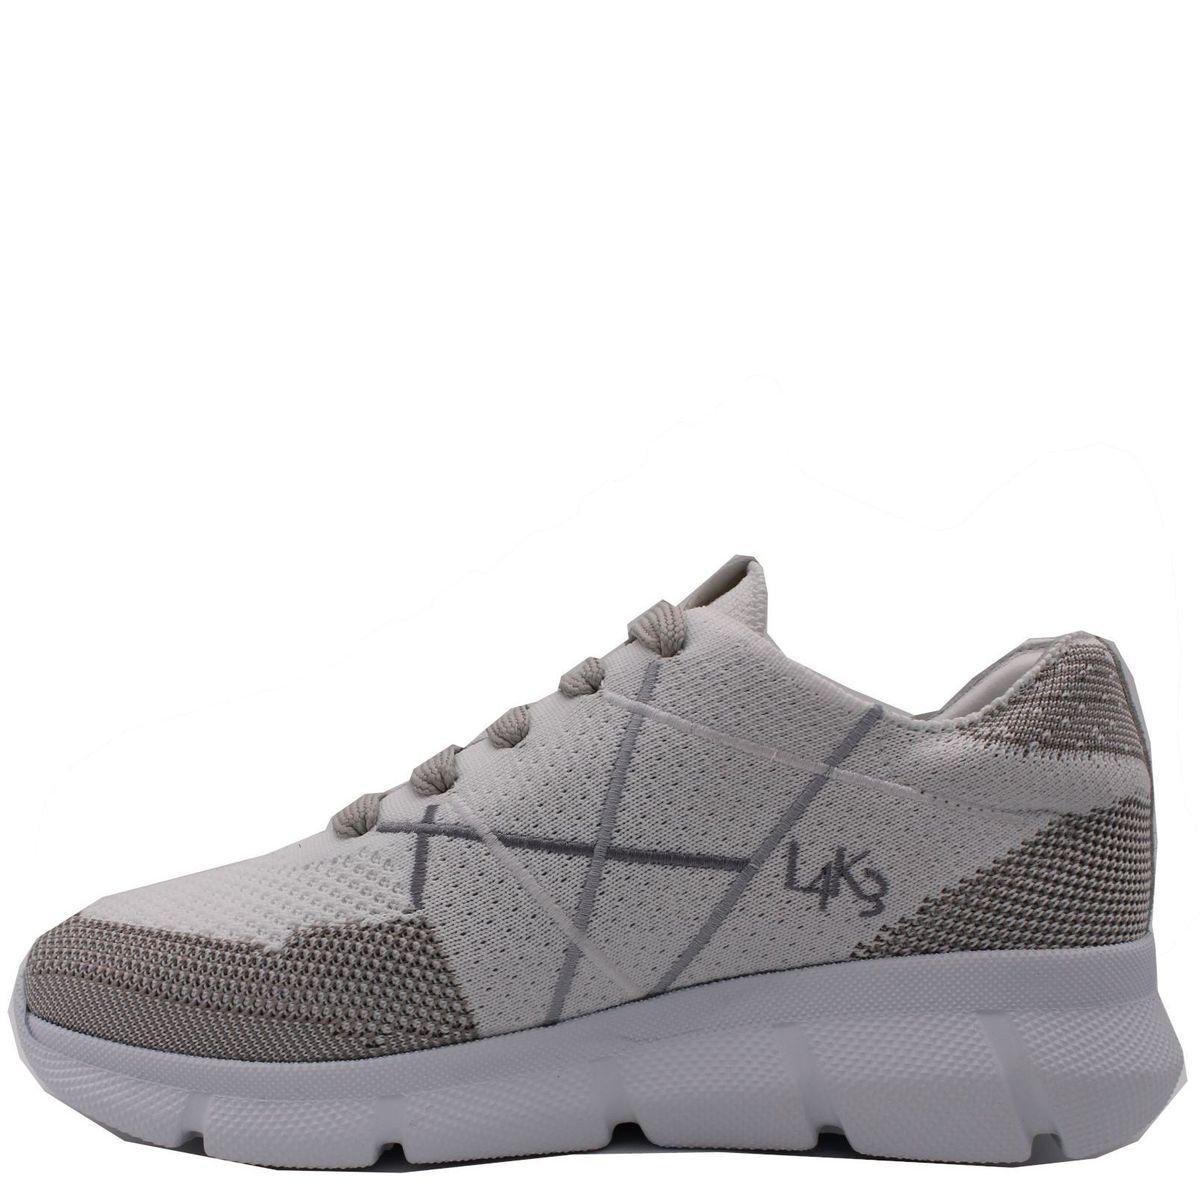 1. Sneakers allacciata con suola in eva ultraleggera L4K3 Bianco L4k3